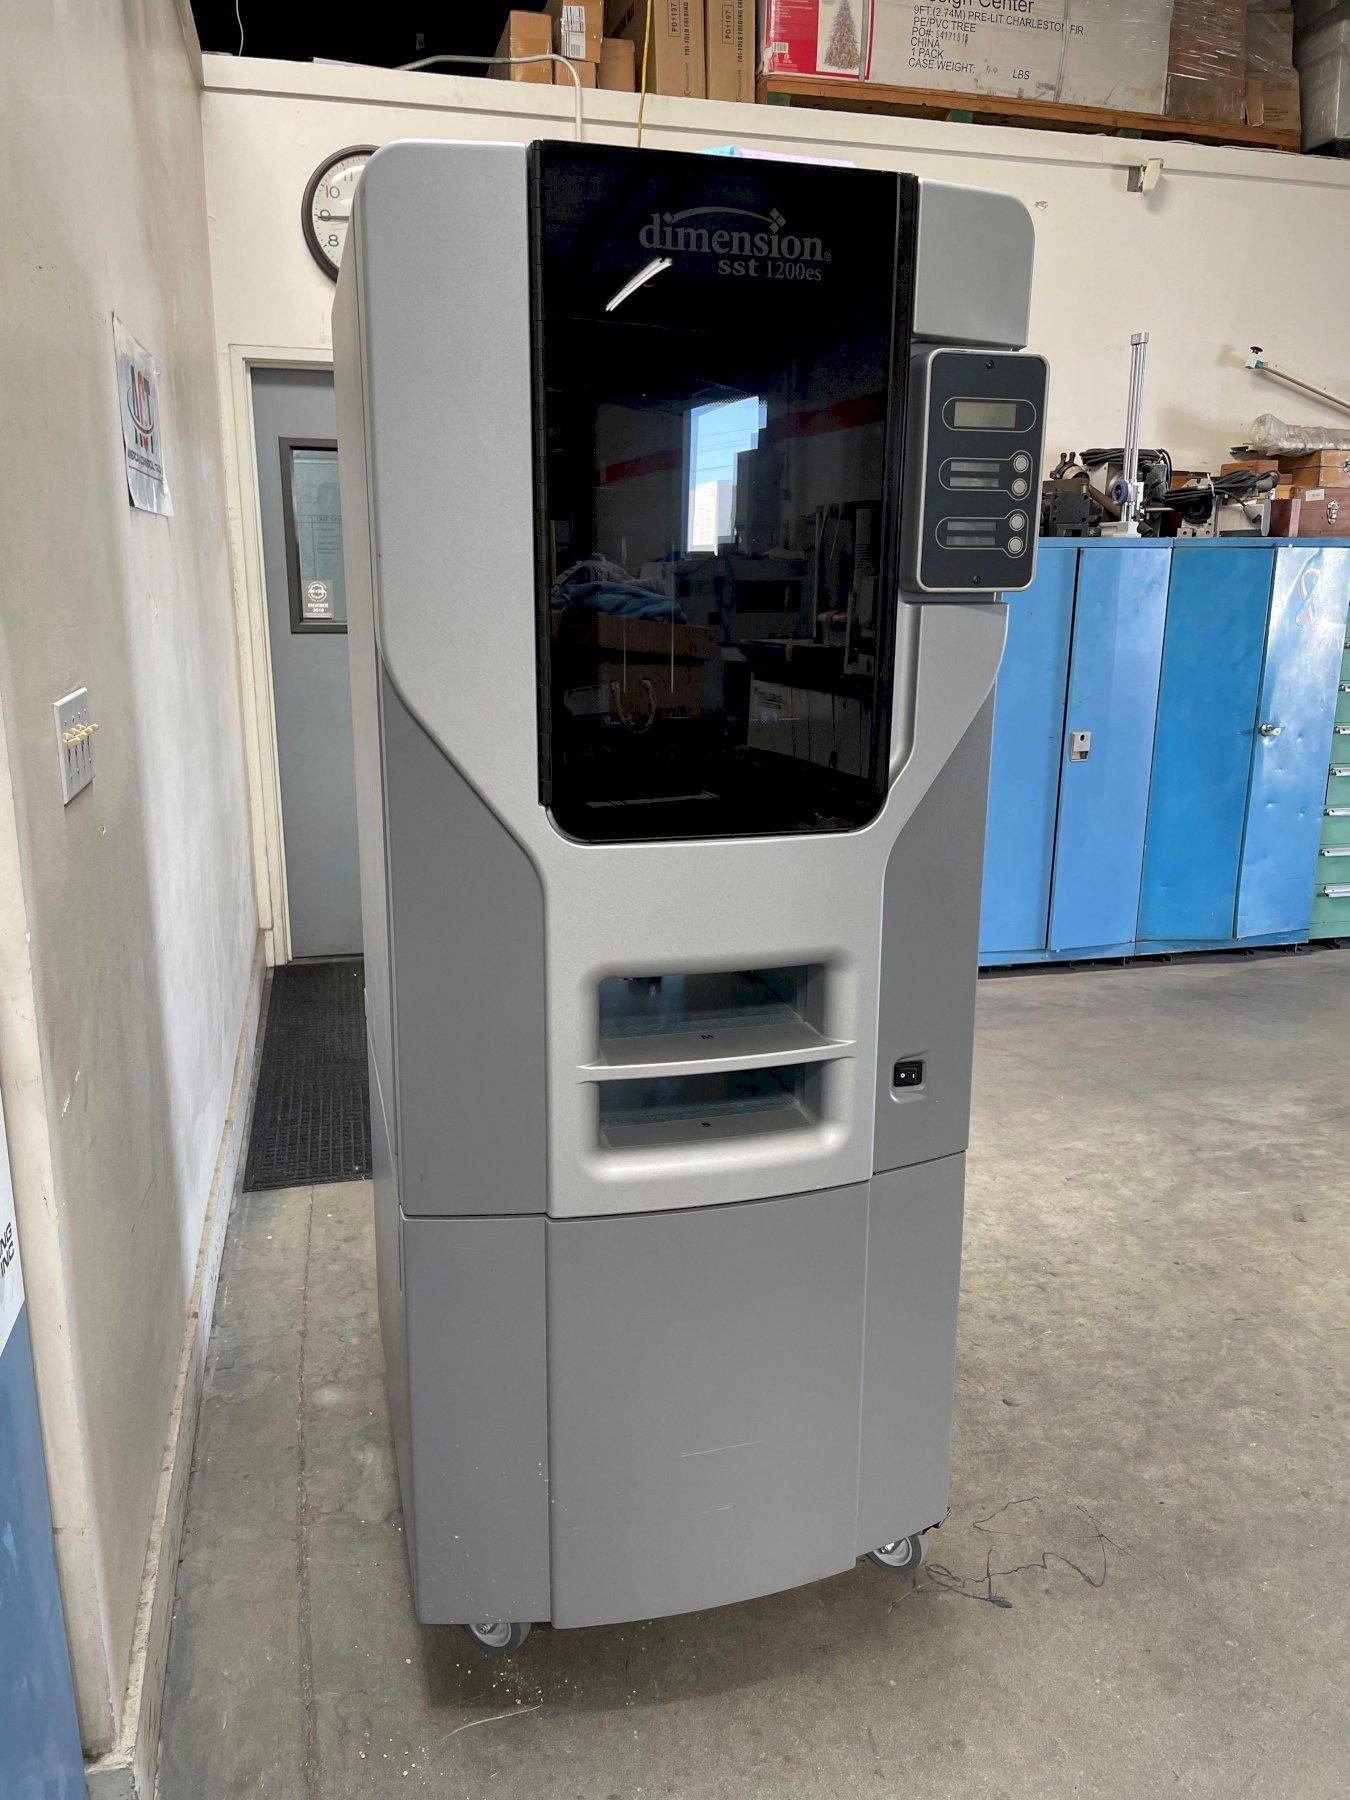 "Stratasys Dimension SST 1200ES 3D Printer 2015, 10"" x 10"" x 12"" Build Volume and SCA-1200HT."